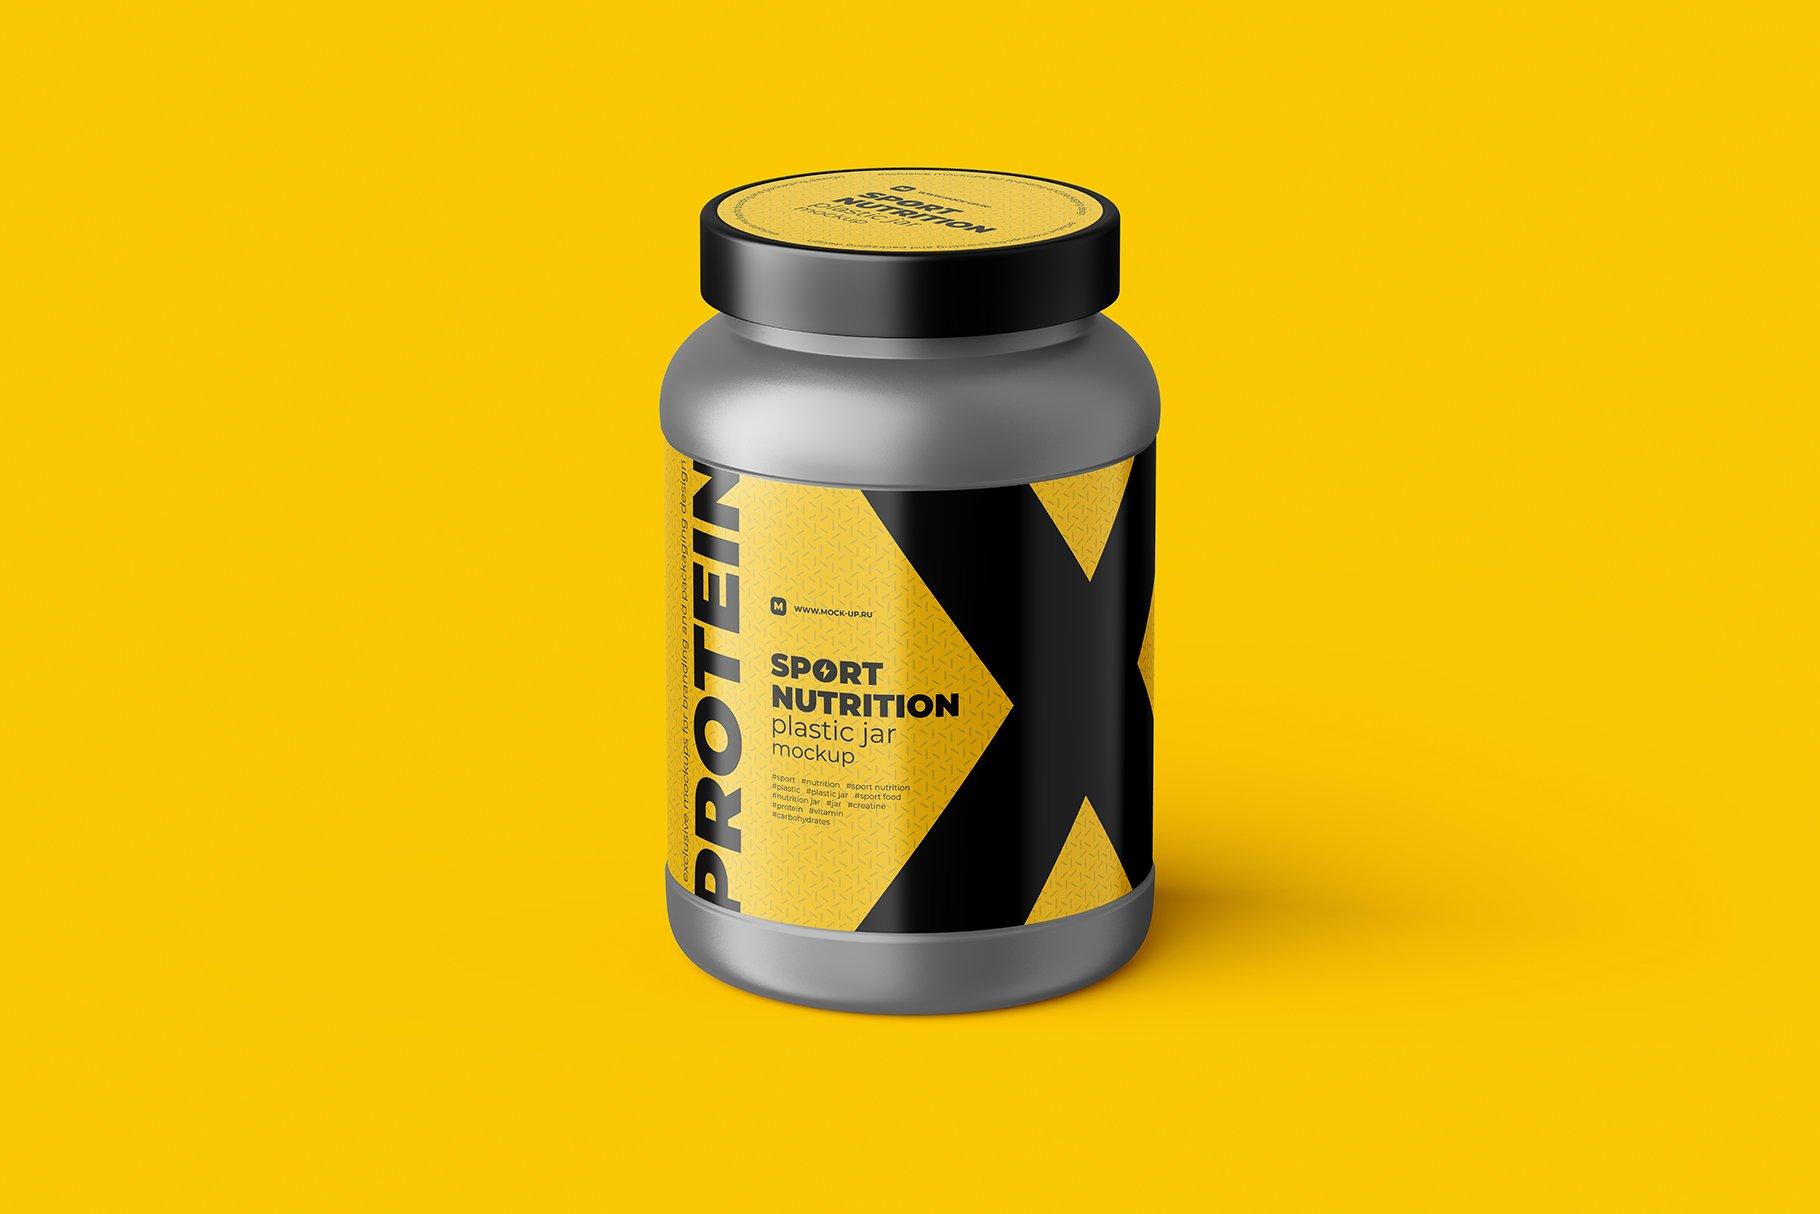 运动营养品果酱塑料罐标签设计展示样机模板 Sport Nutrition Plastic Jar Mockup插图5